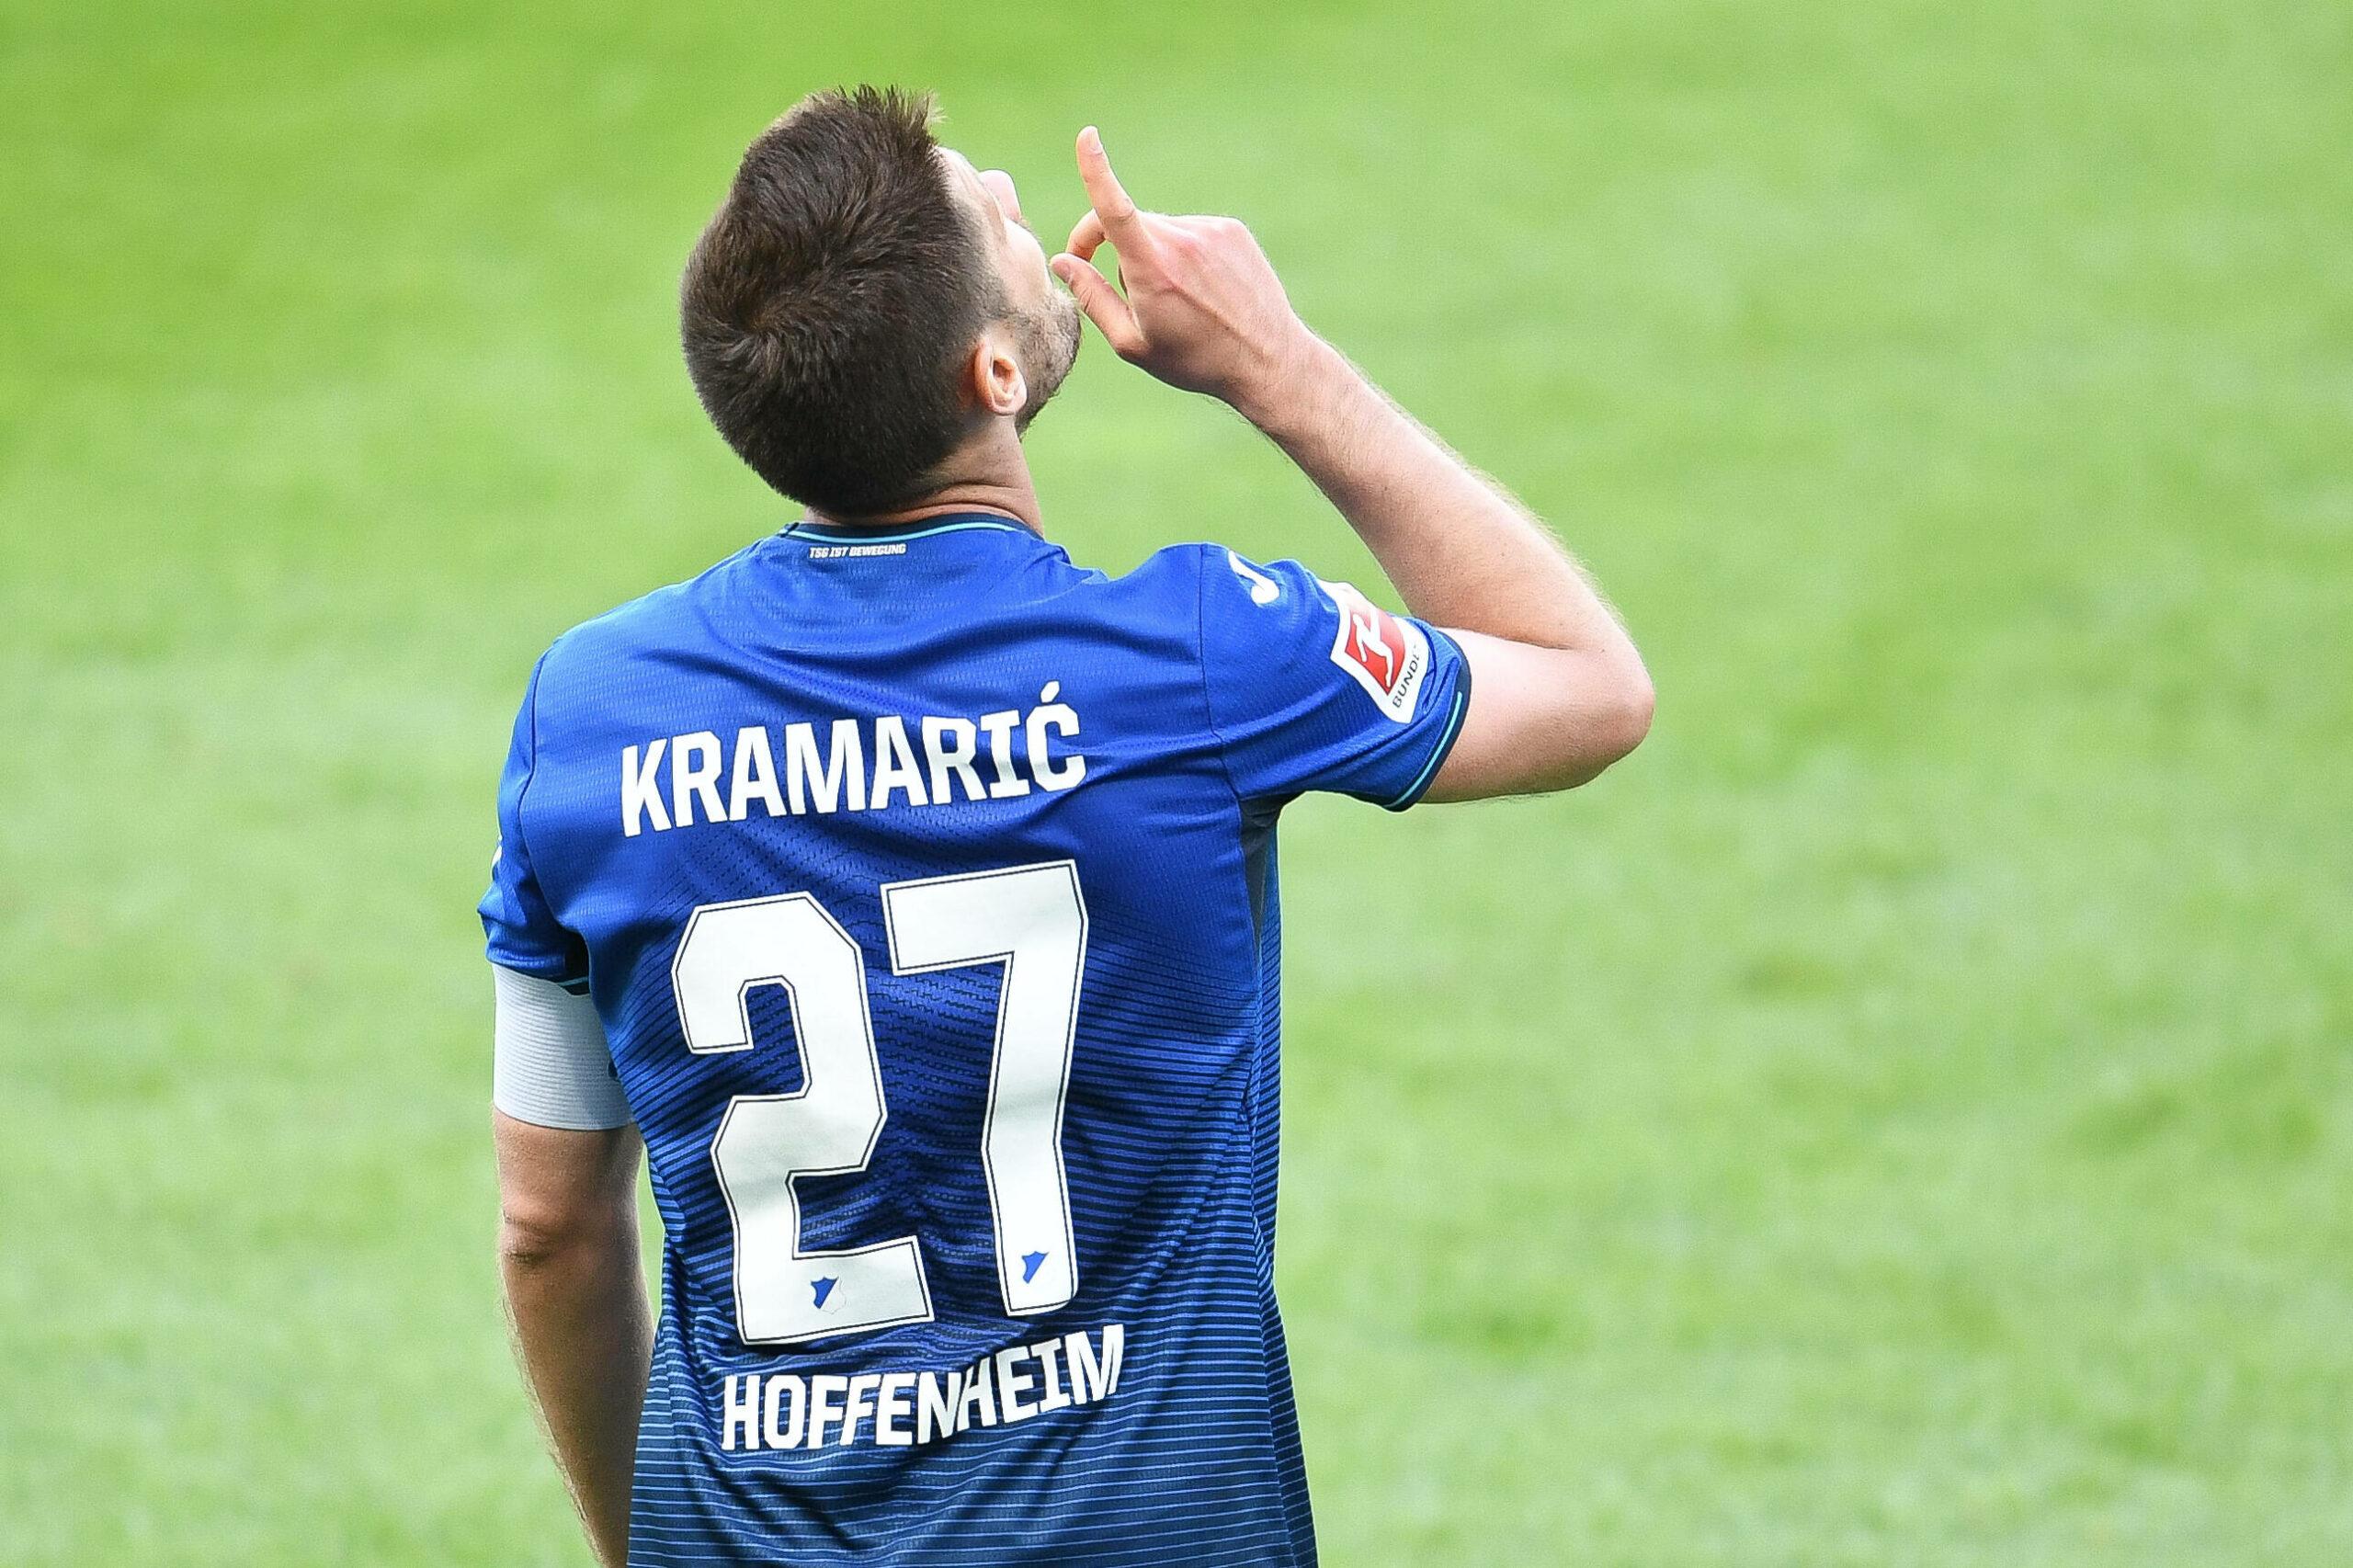 Kramaric (Hoffenheim) bejubelt Treffer